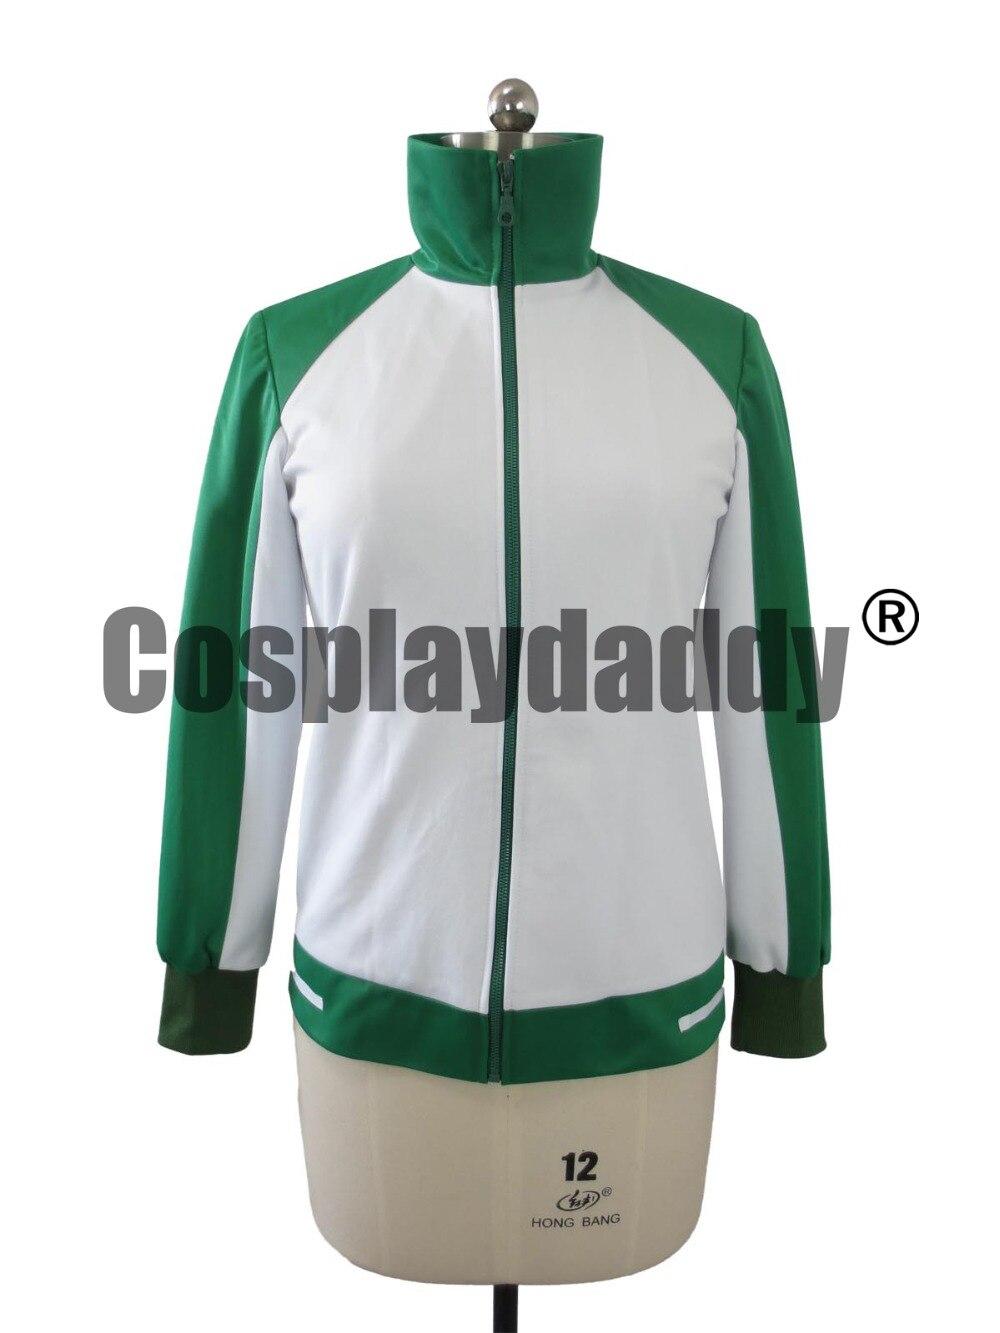 Durarara!! Mikado Ryuugamine Mikado Coat Jacket Sportswear Cosplay Costume C018